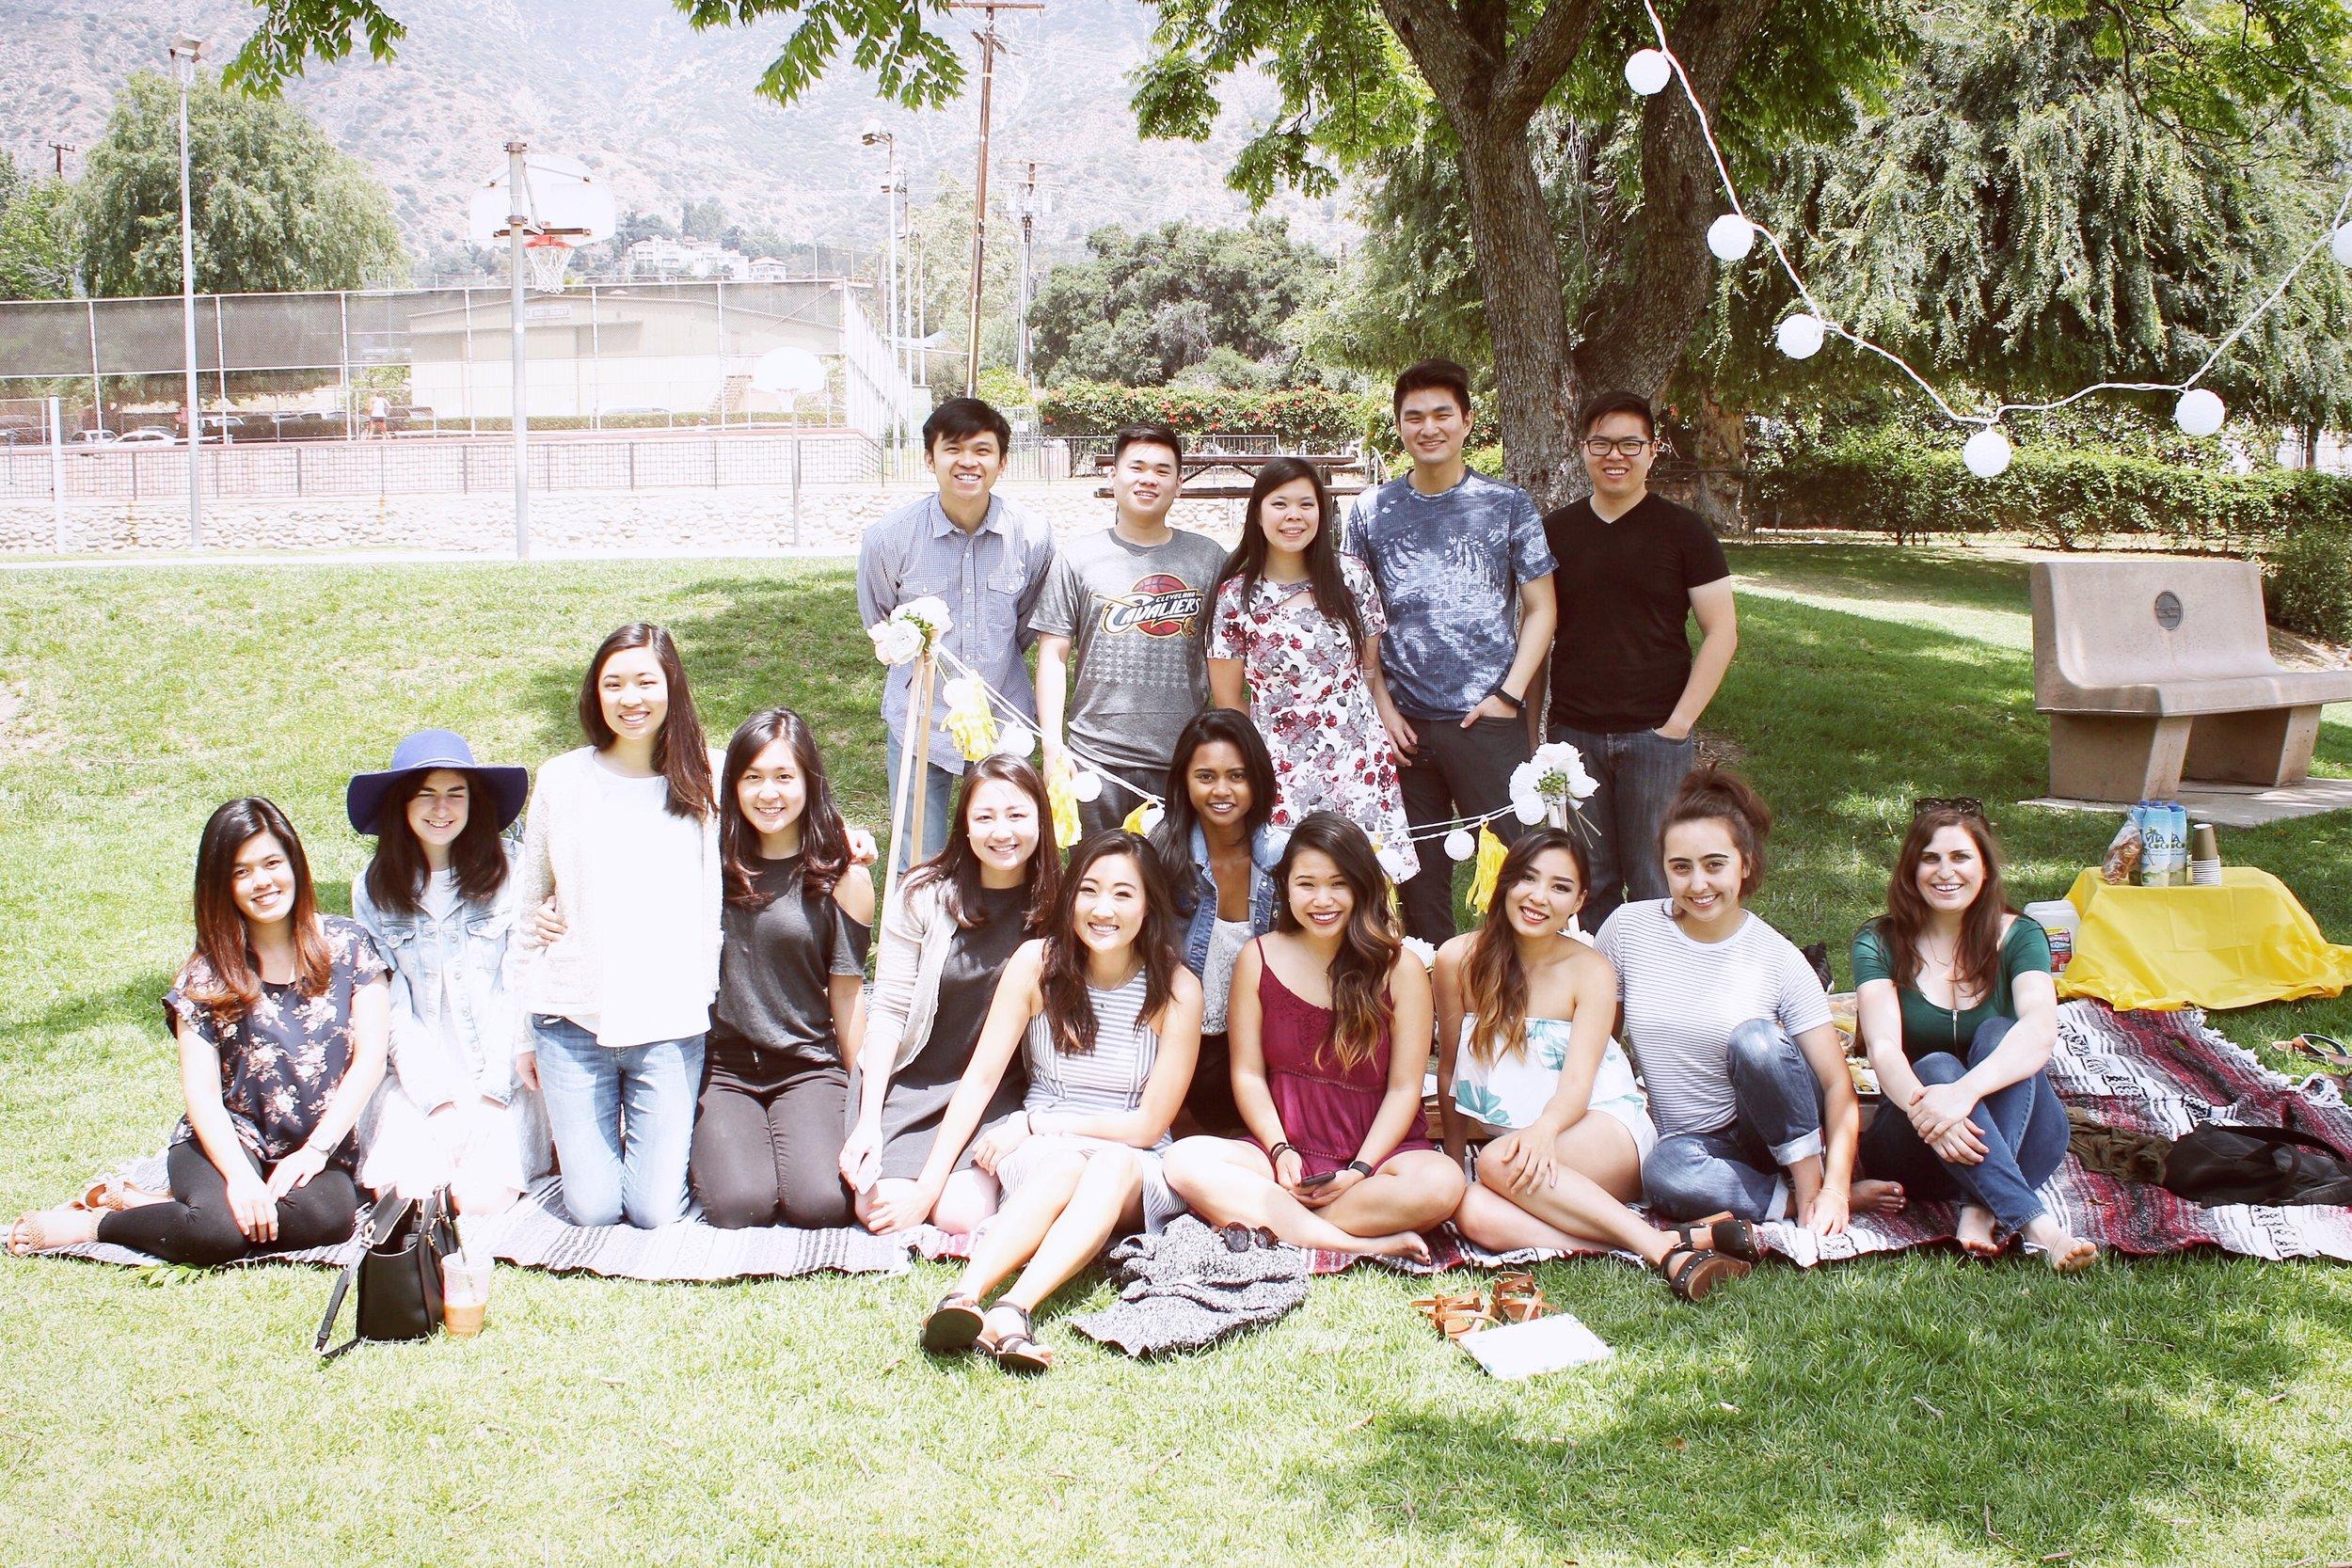 girlandtheword-boho-style-graduation-picnic-party-12